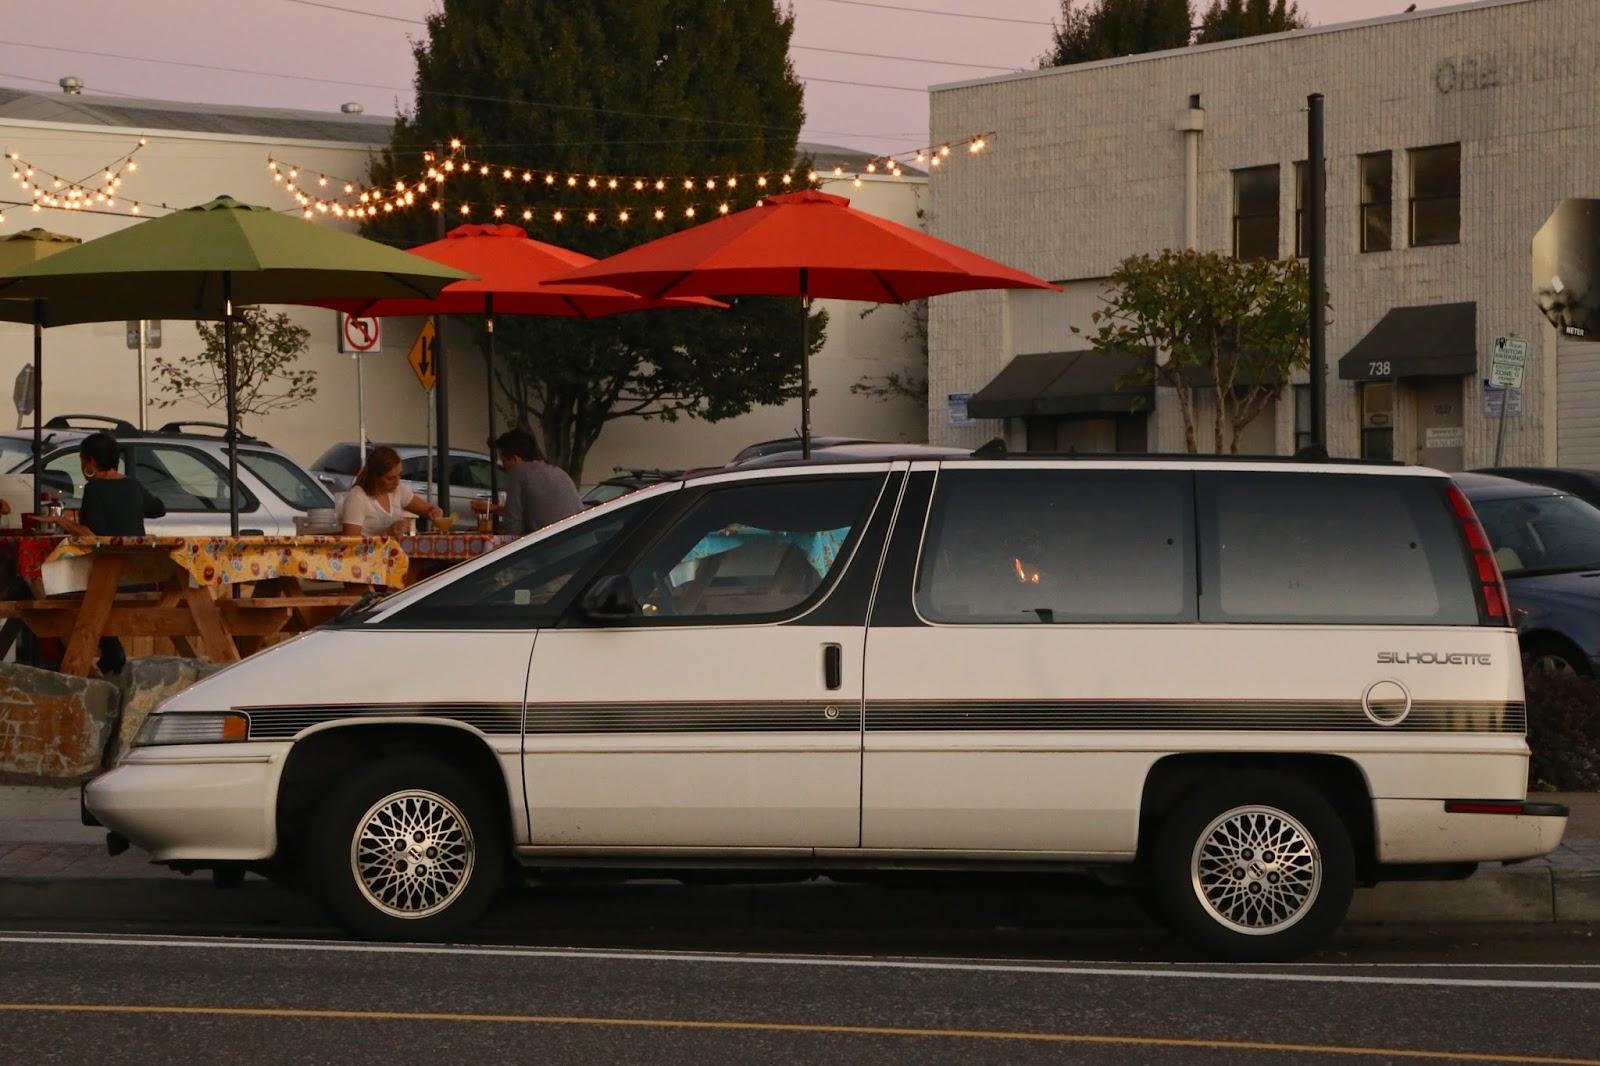 1990 Oldsmobile Silhouette minivan